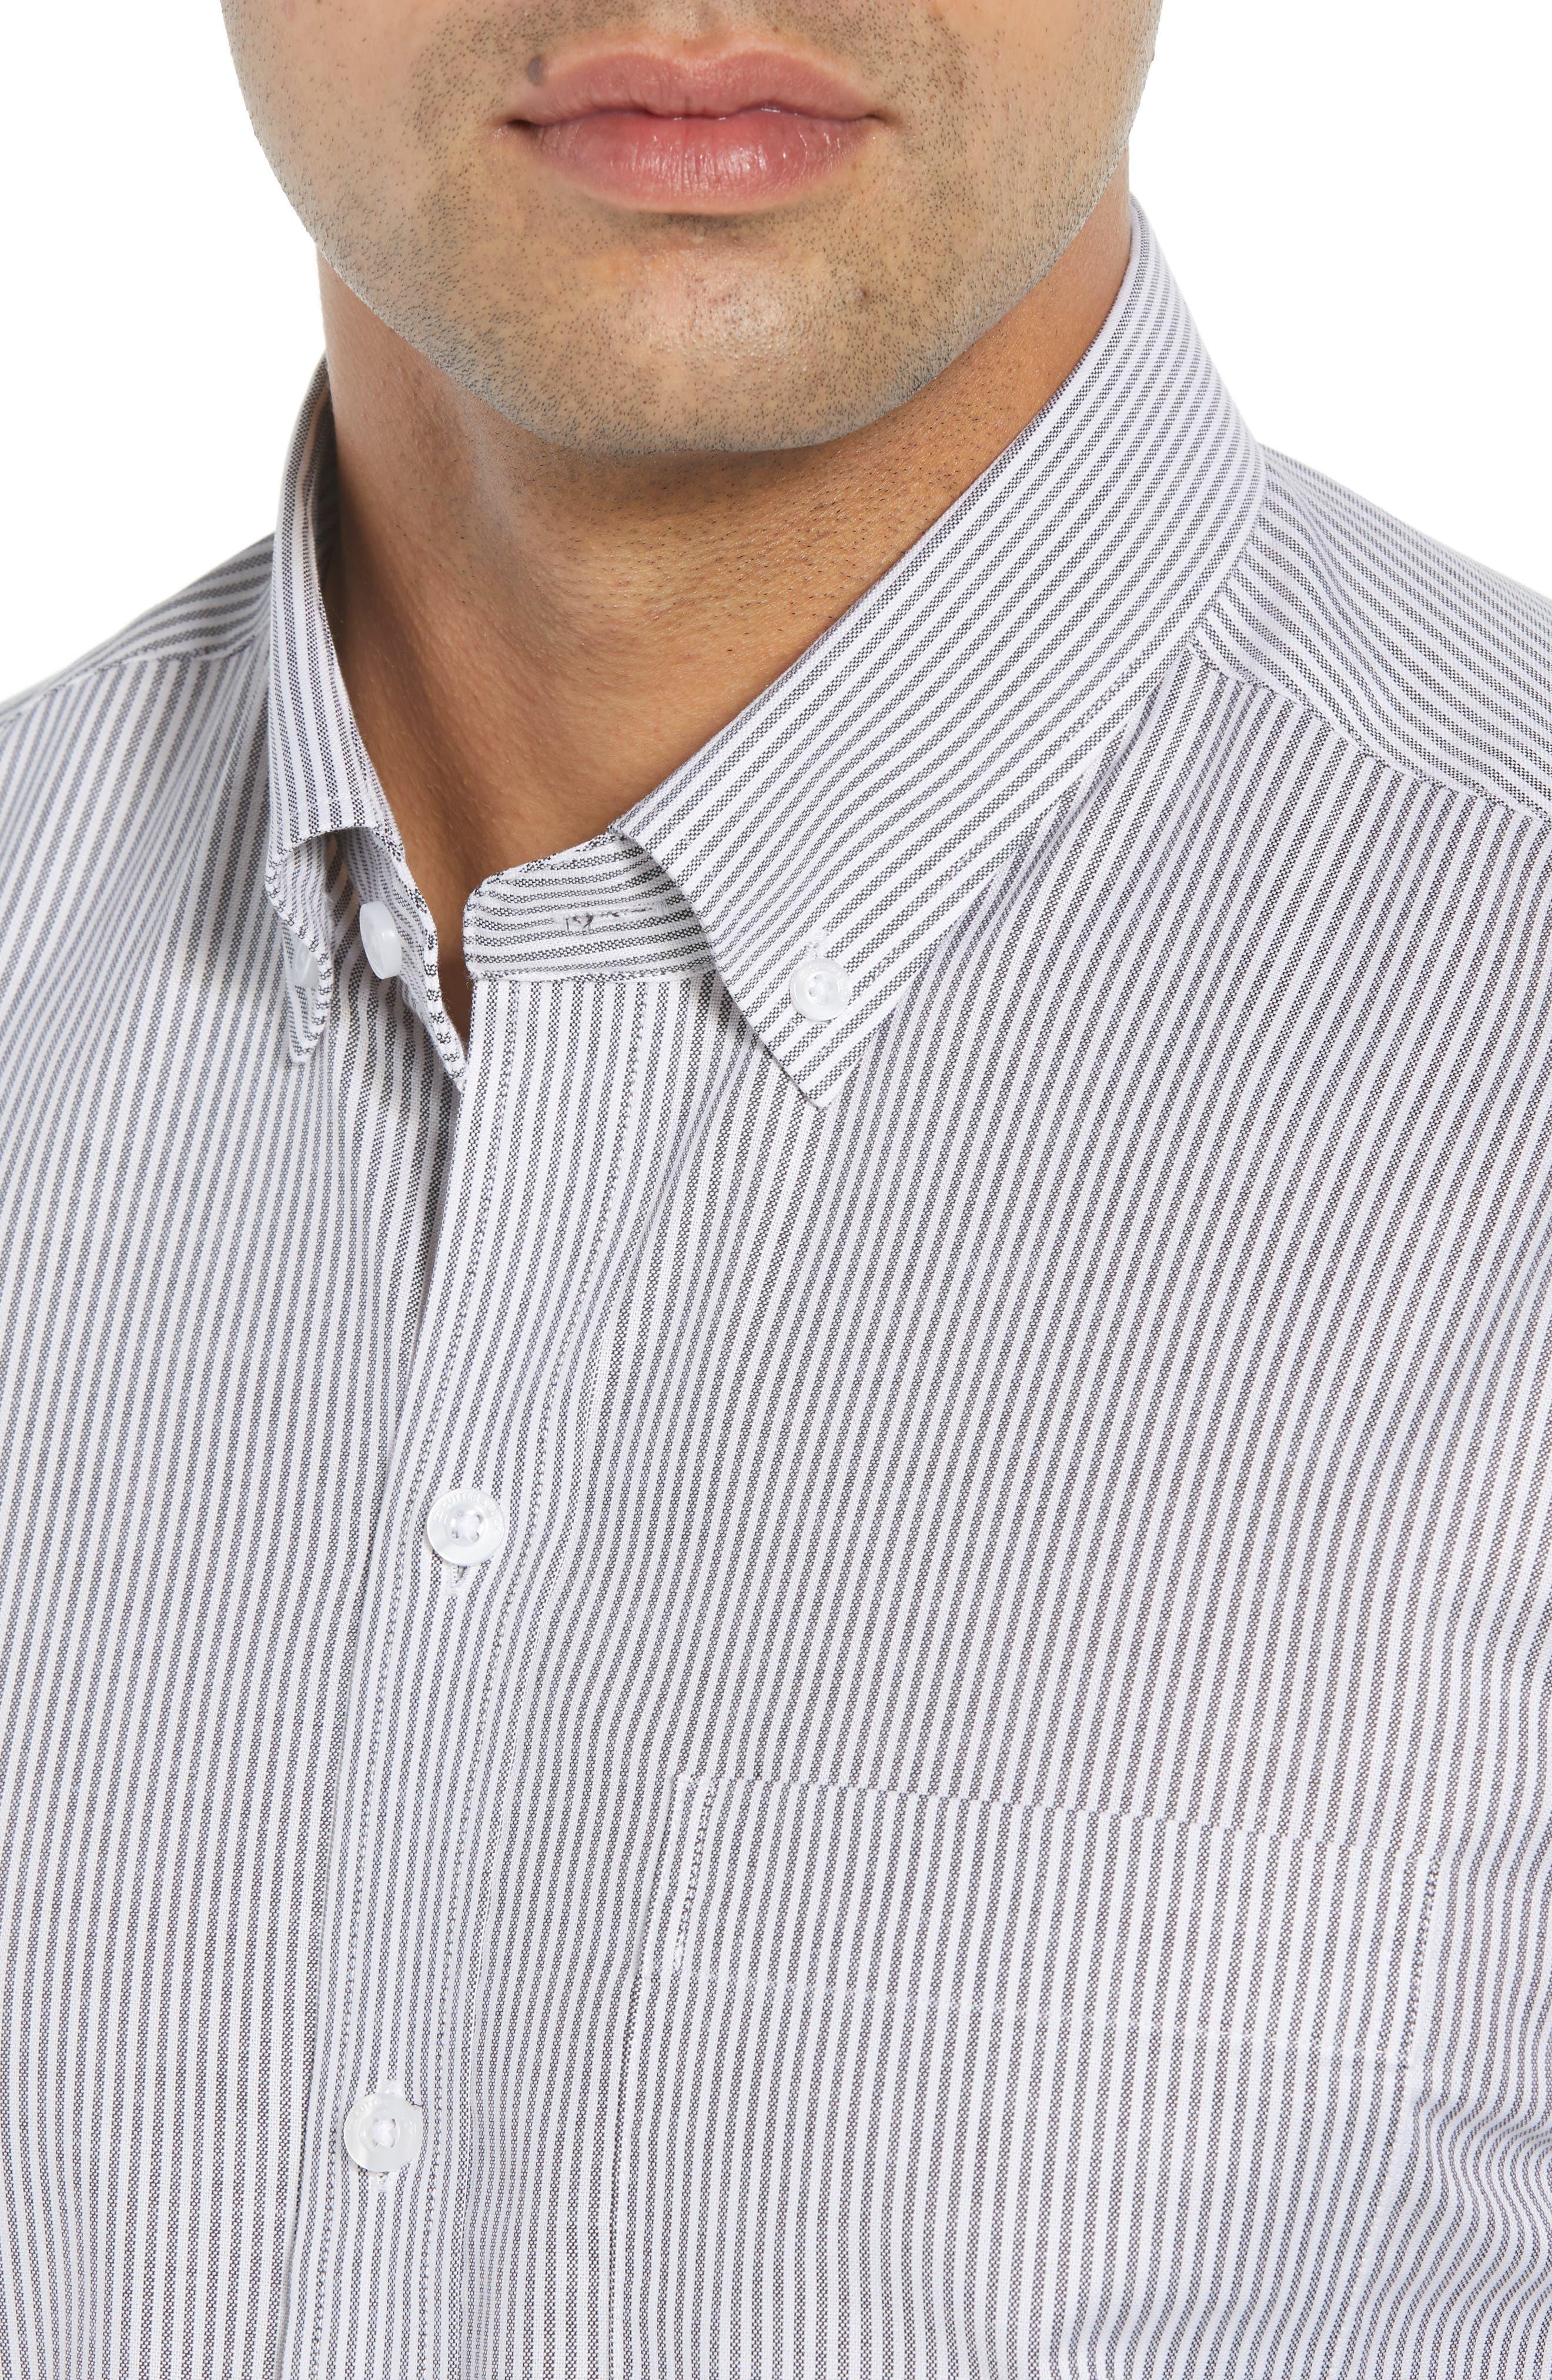 Regular Fit Stripe Stretch Oxford Shirt,                             Alternate thumbnail 2, color,                             CHARCOAL